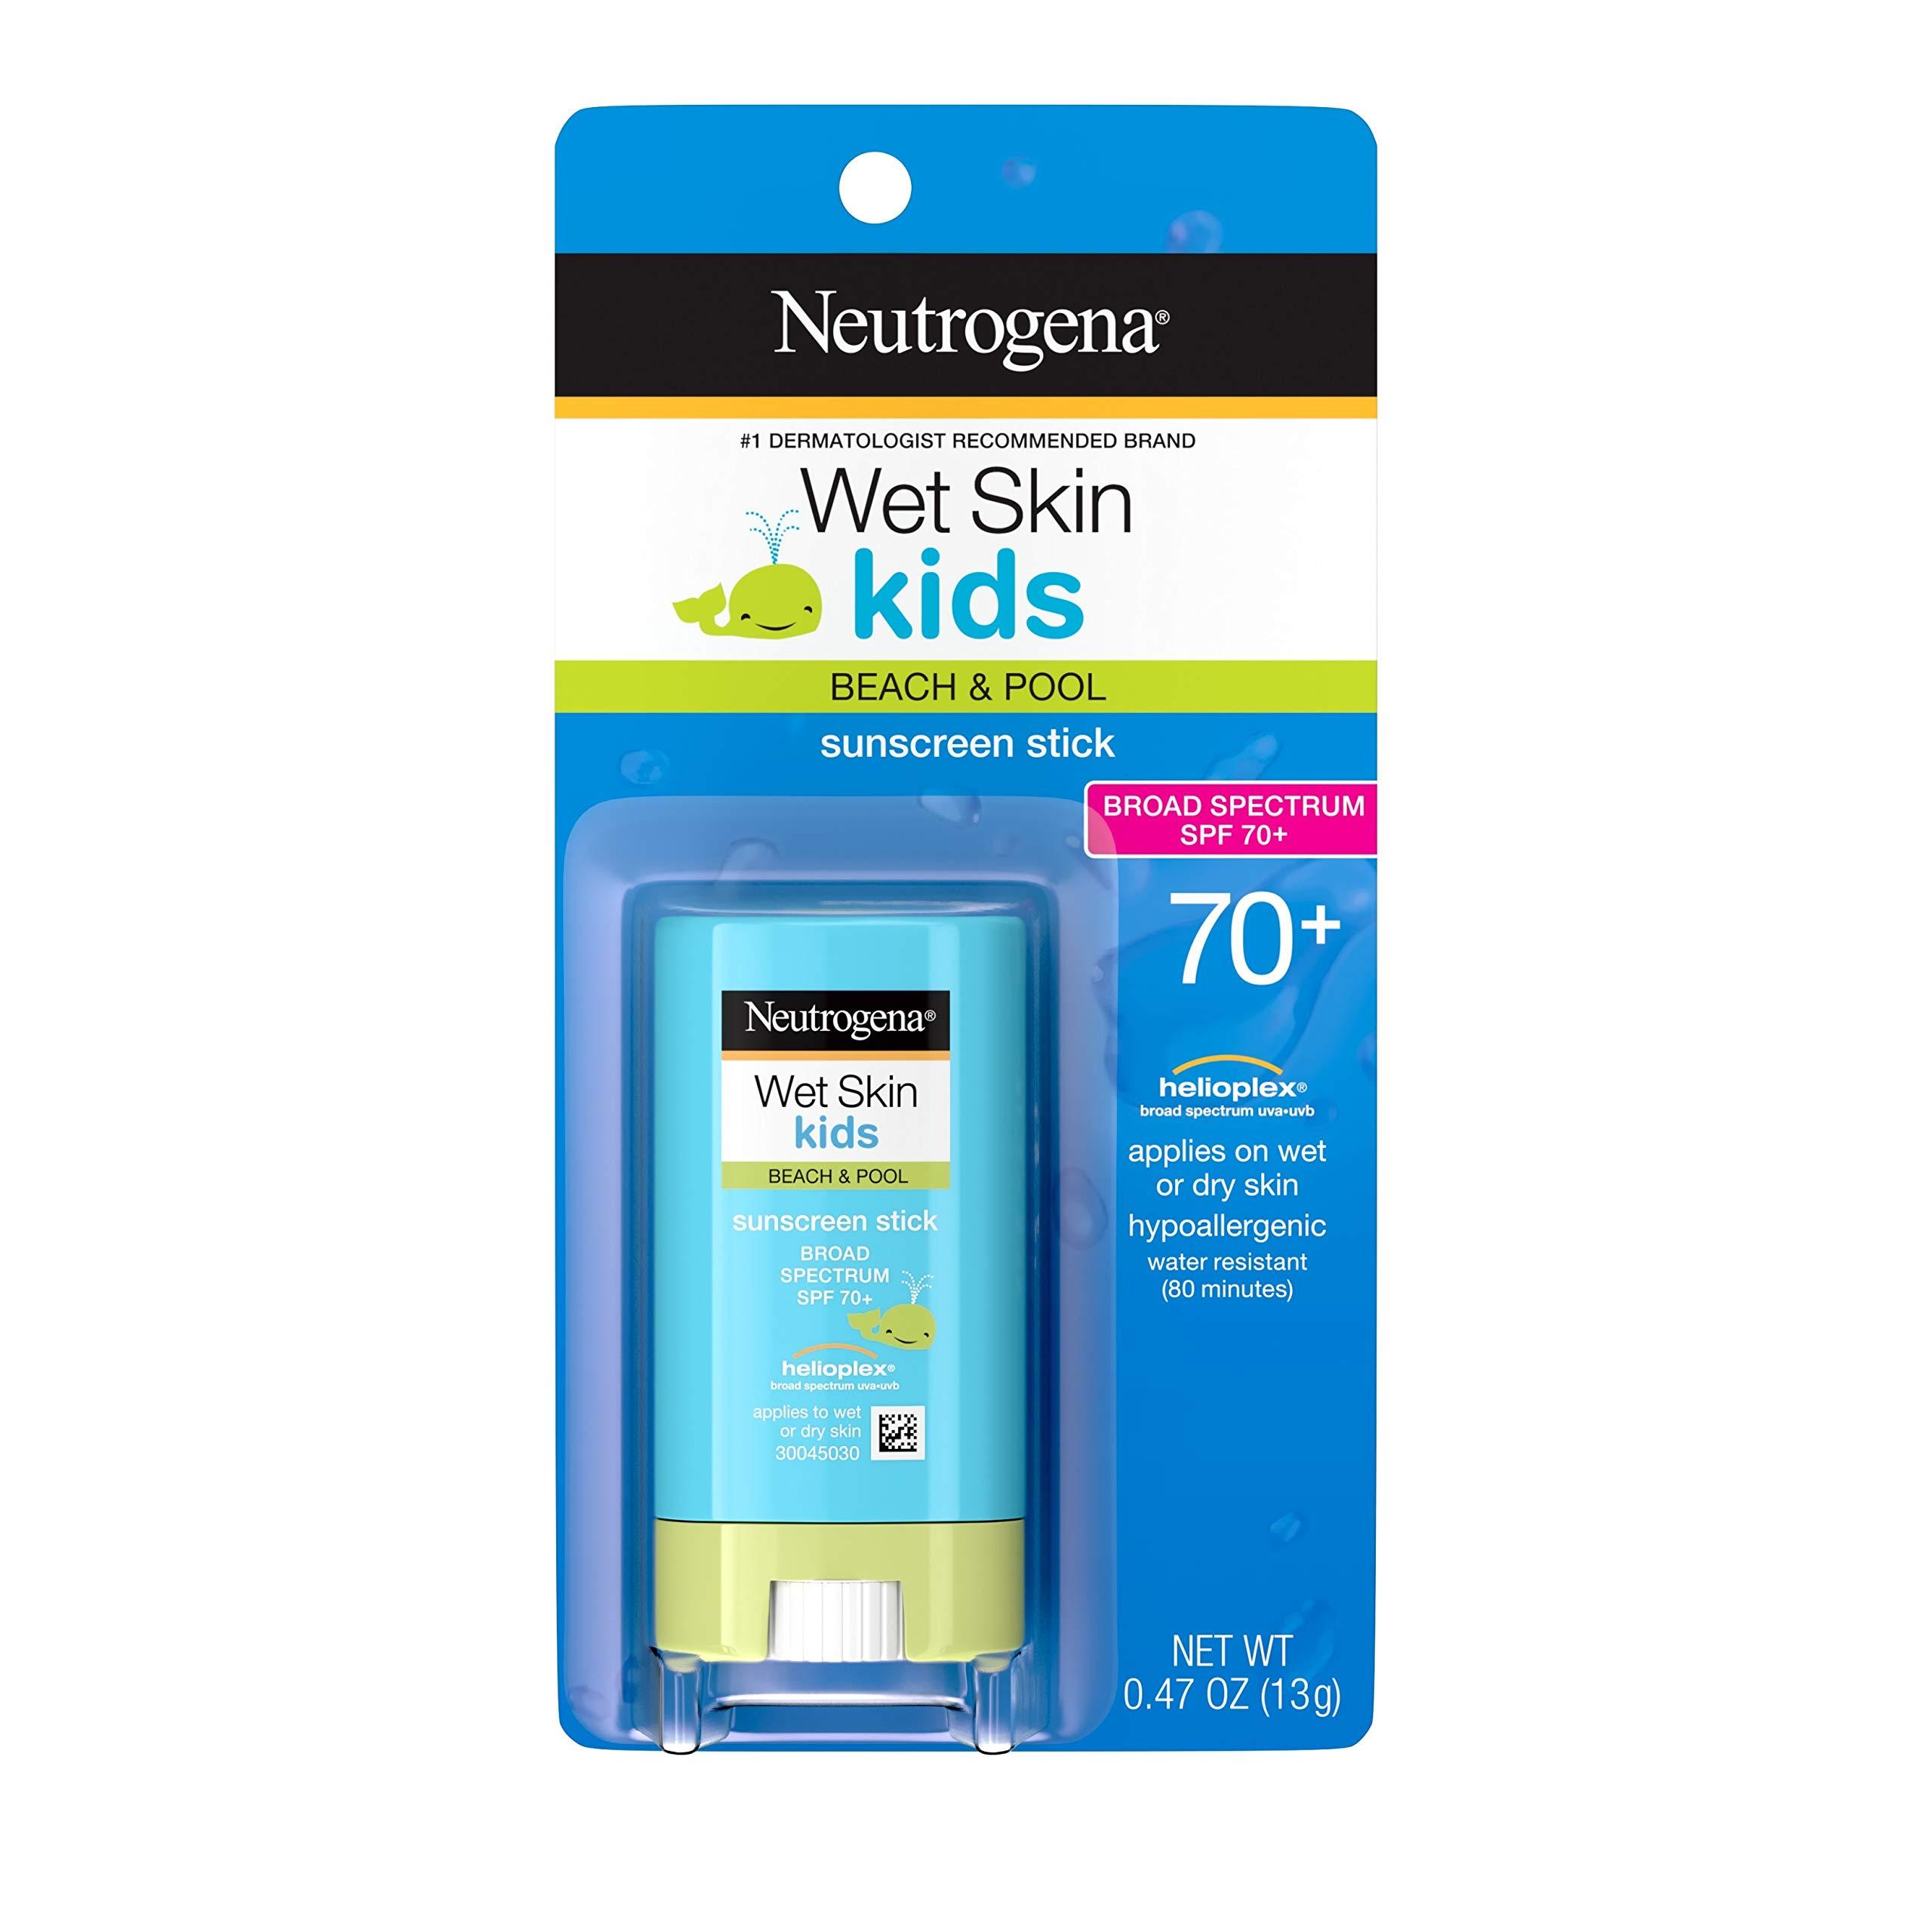 Neutrogena Wet 0.47 oz